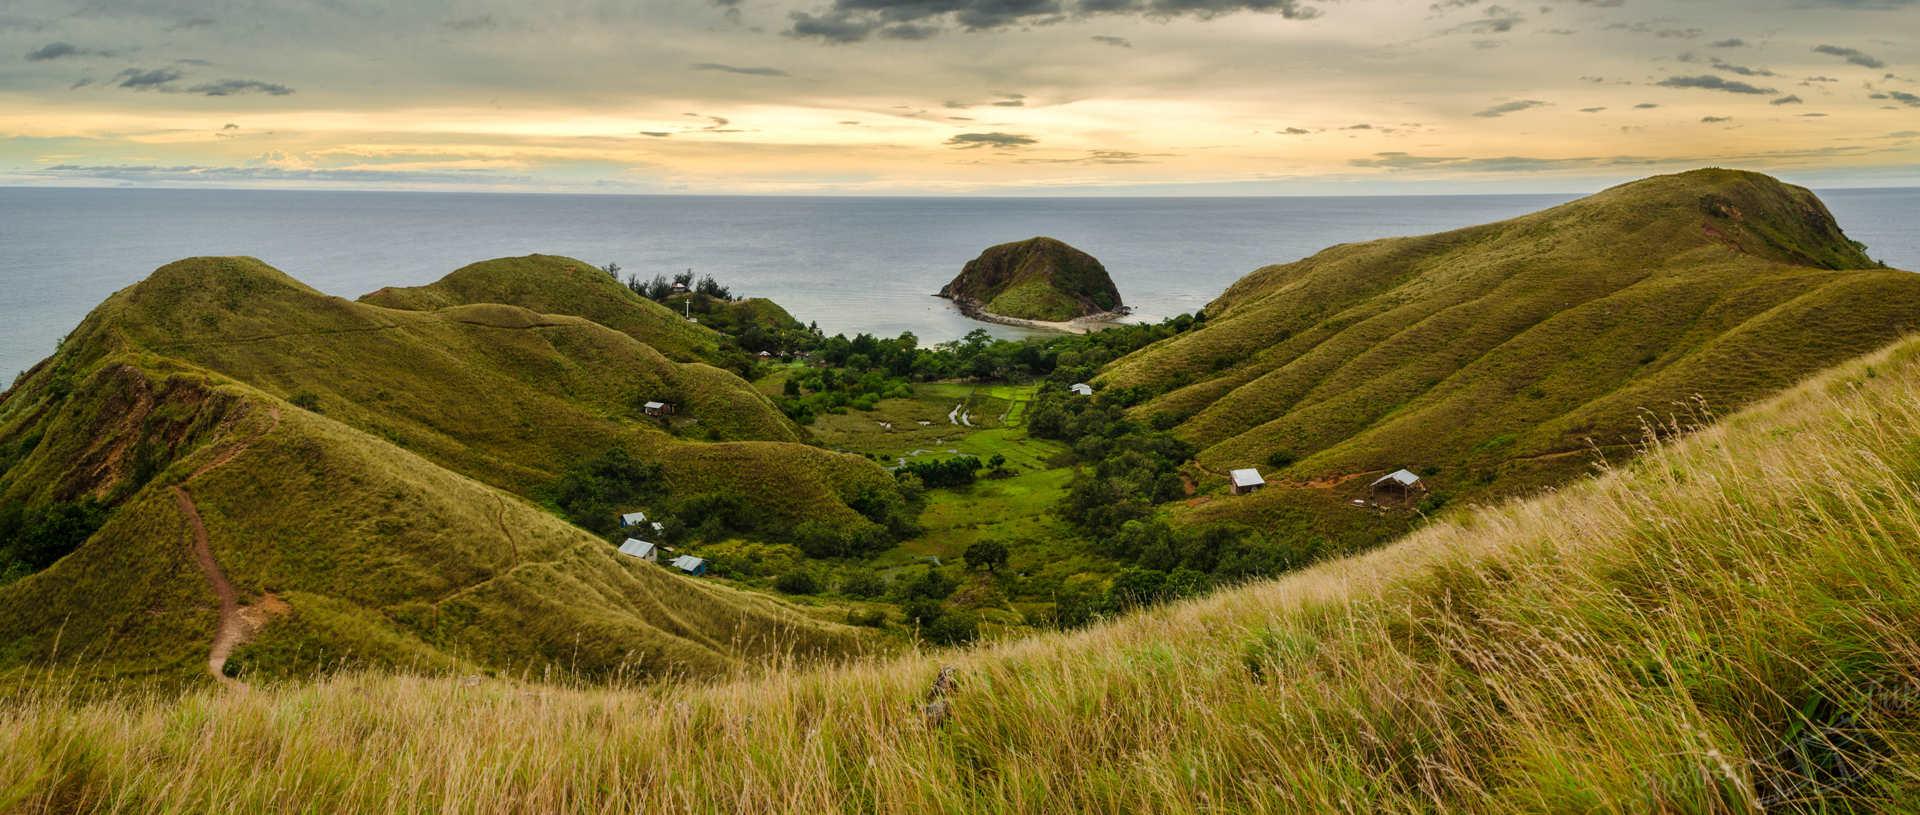 mararison island, mararison, antique, panorama mararison, mararison hike